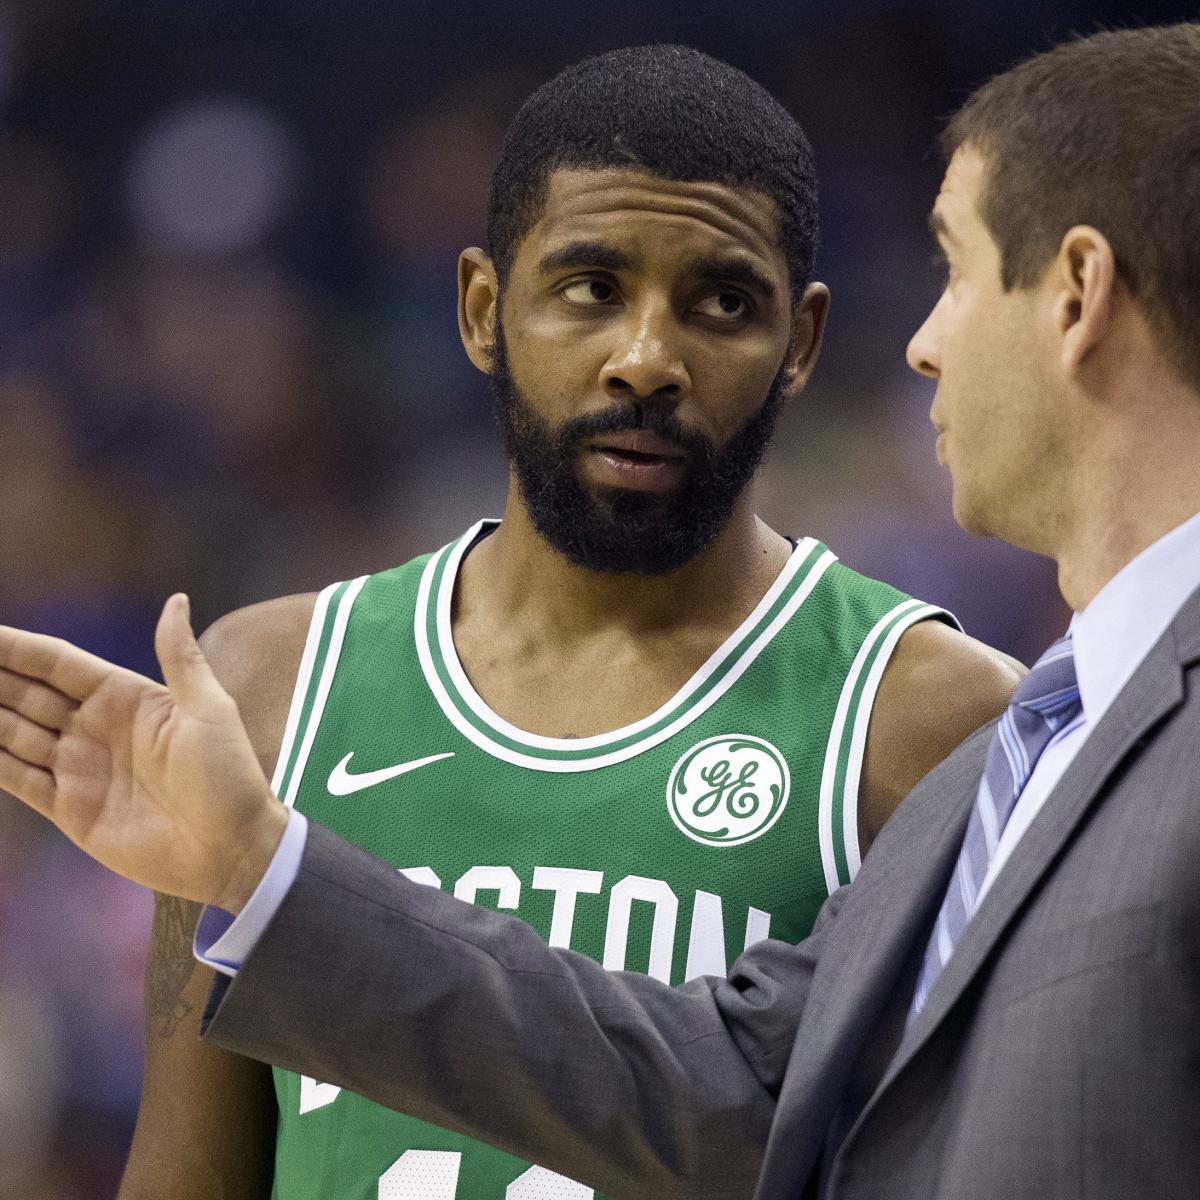 37e36265601b1 Brad Stevens thinks his Celtics aren t committing on defense and instead  taking shortcuts.